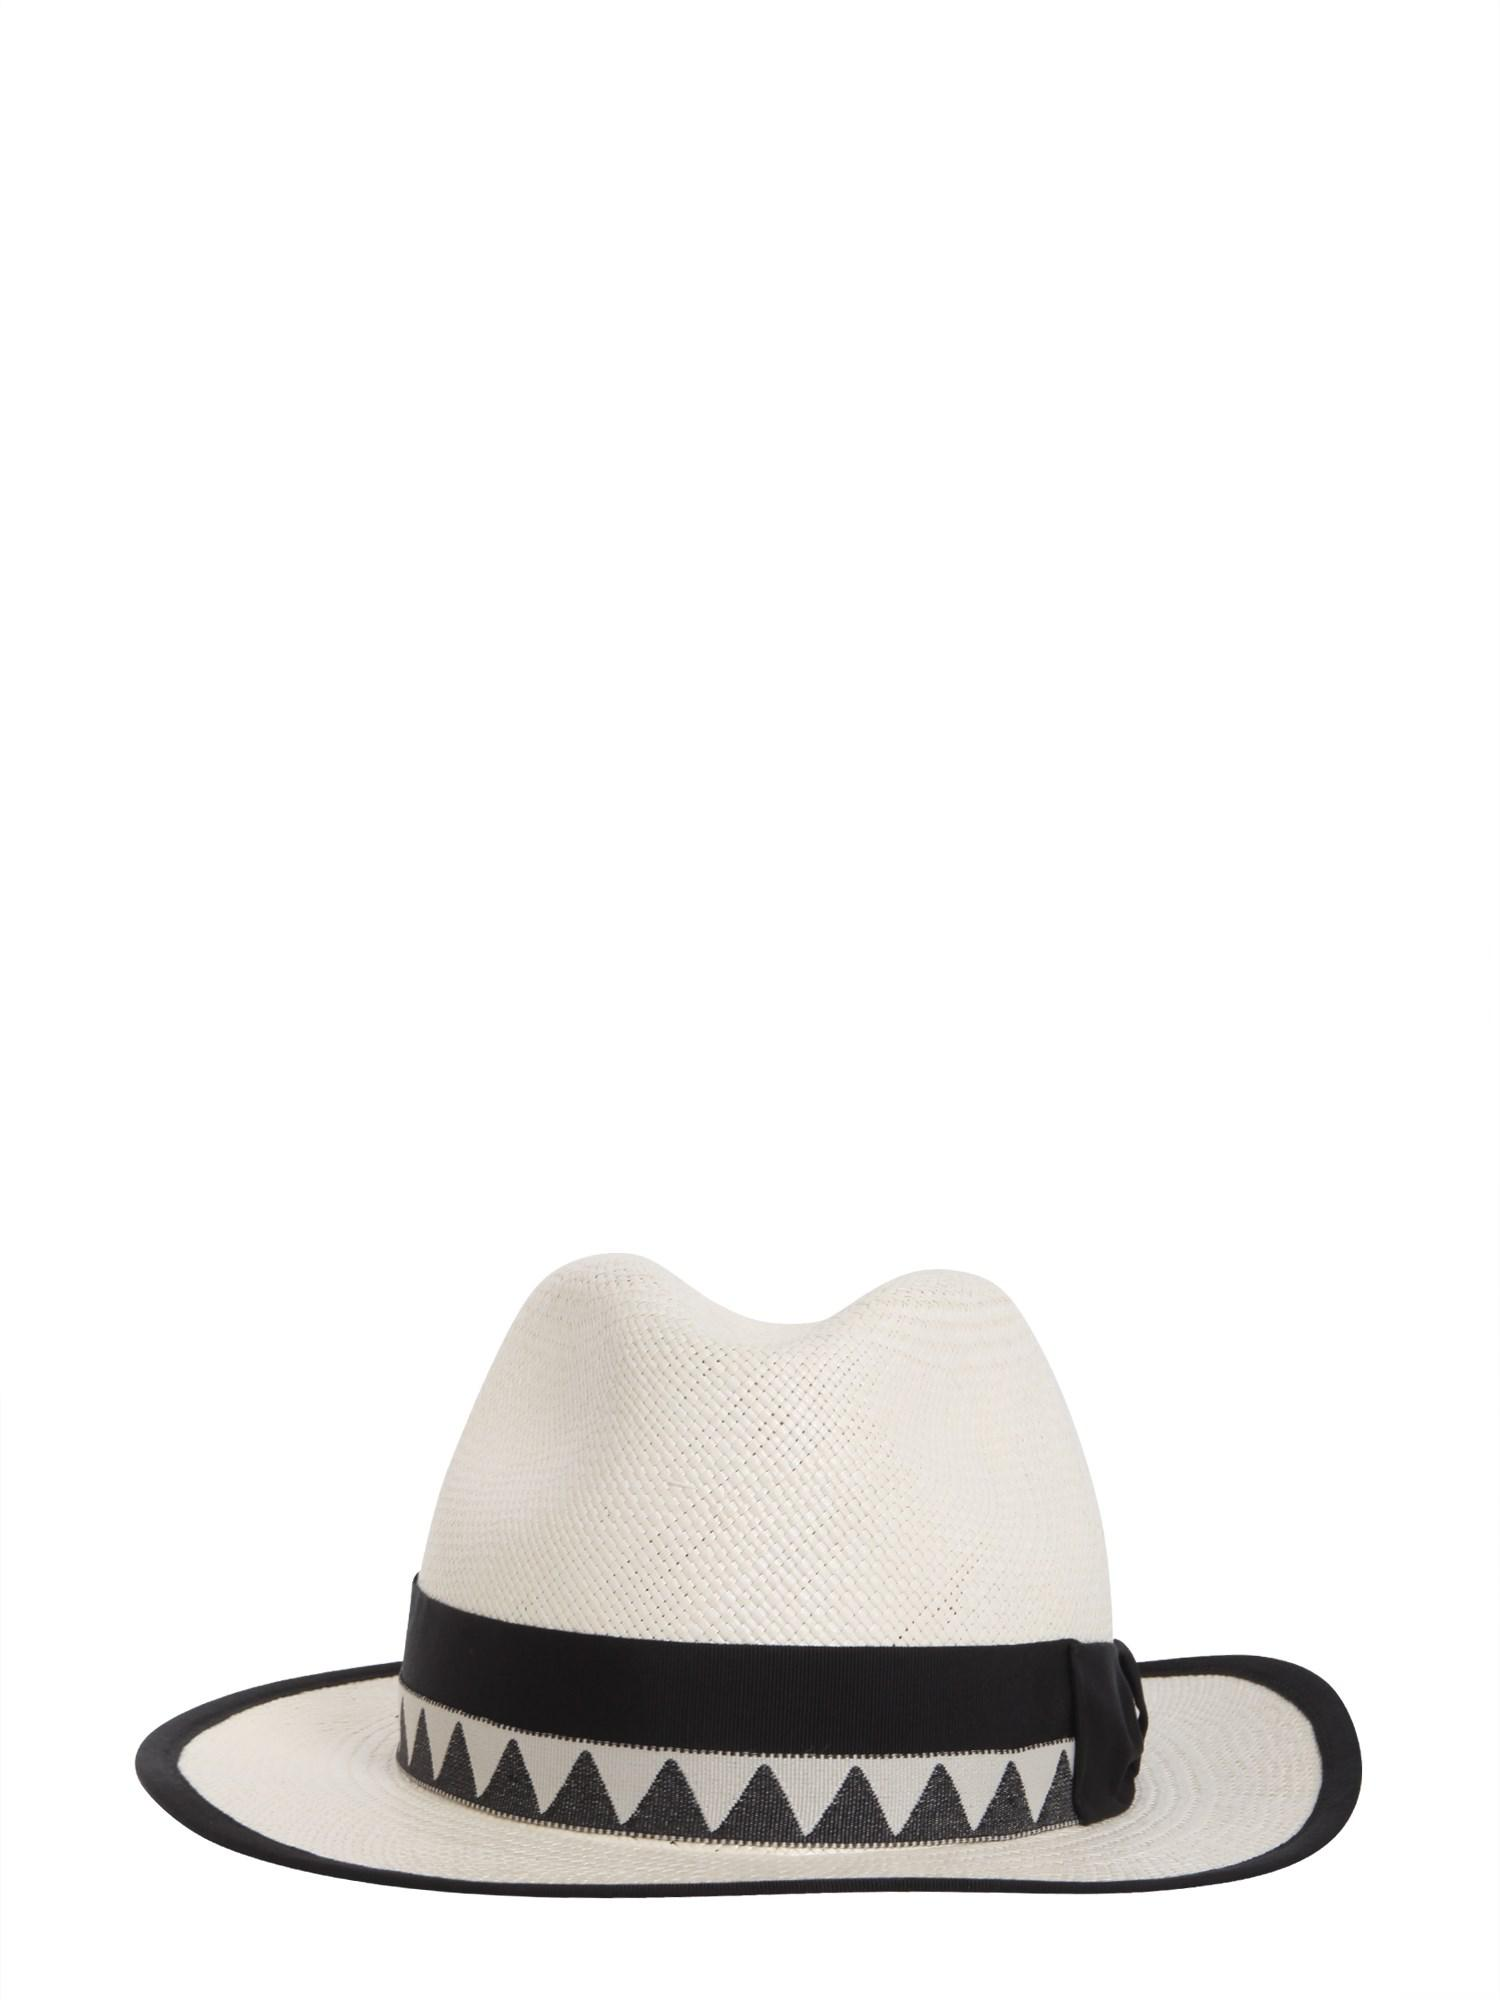 Borsalino Panama Quito Jacquard Straw Cap in White - Lyst 356c89ec2893